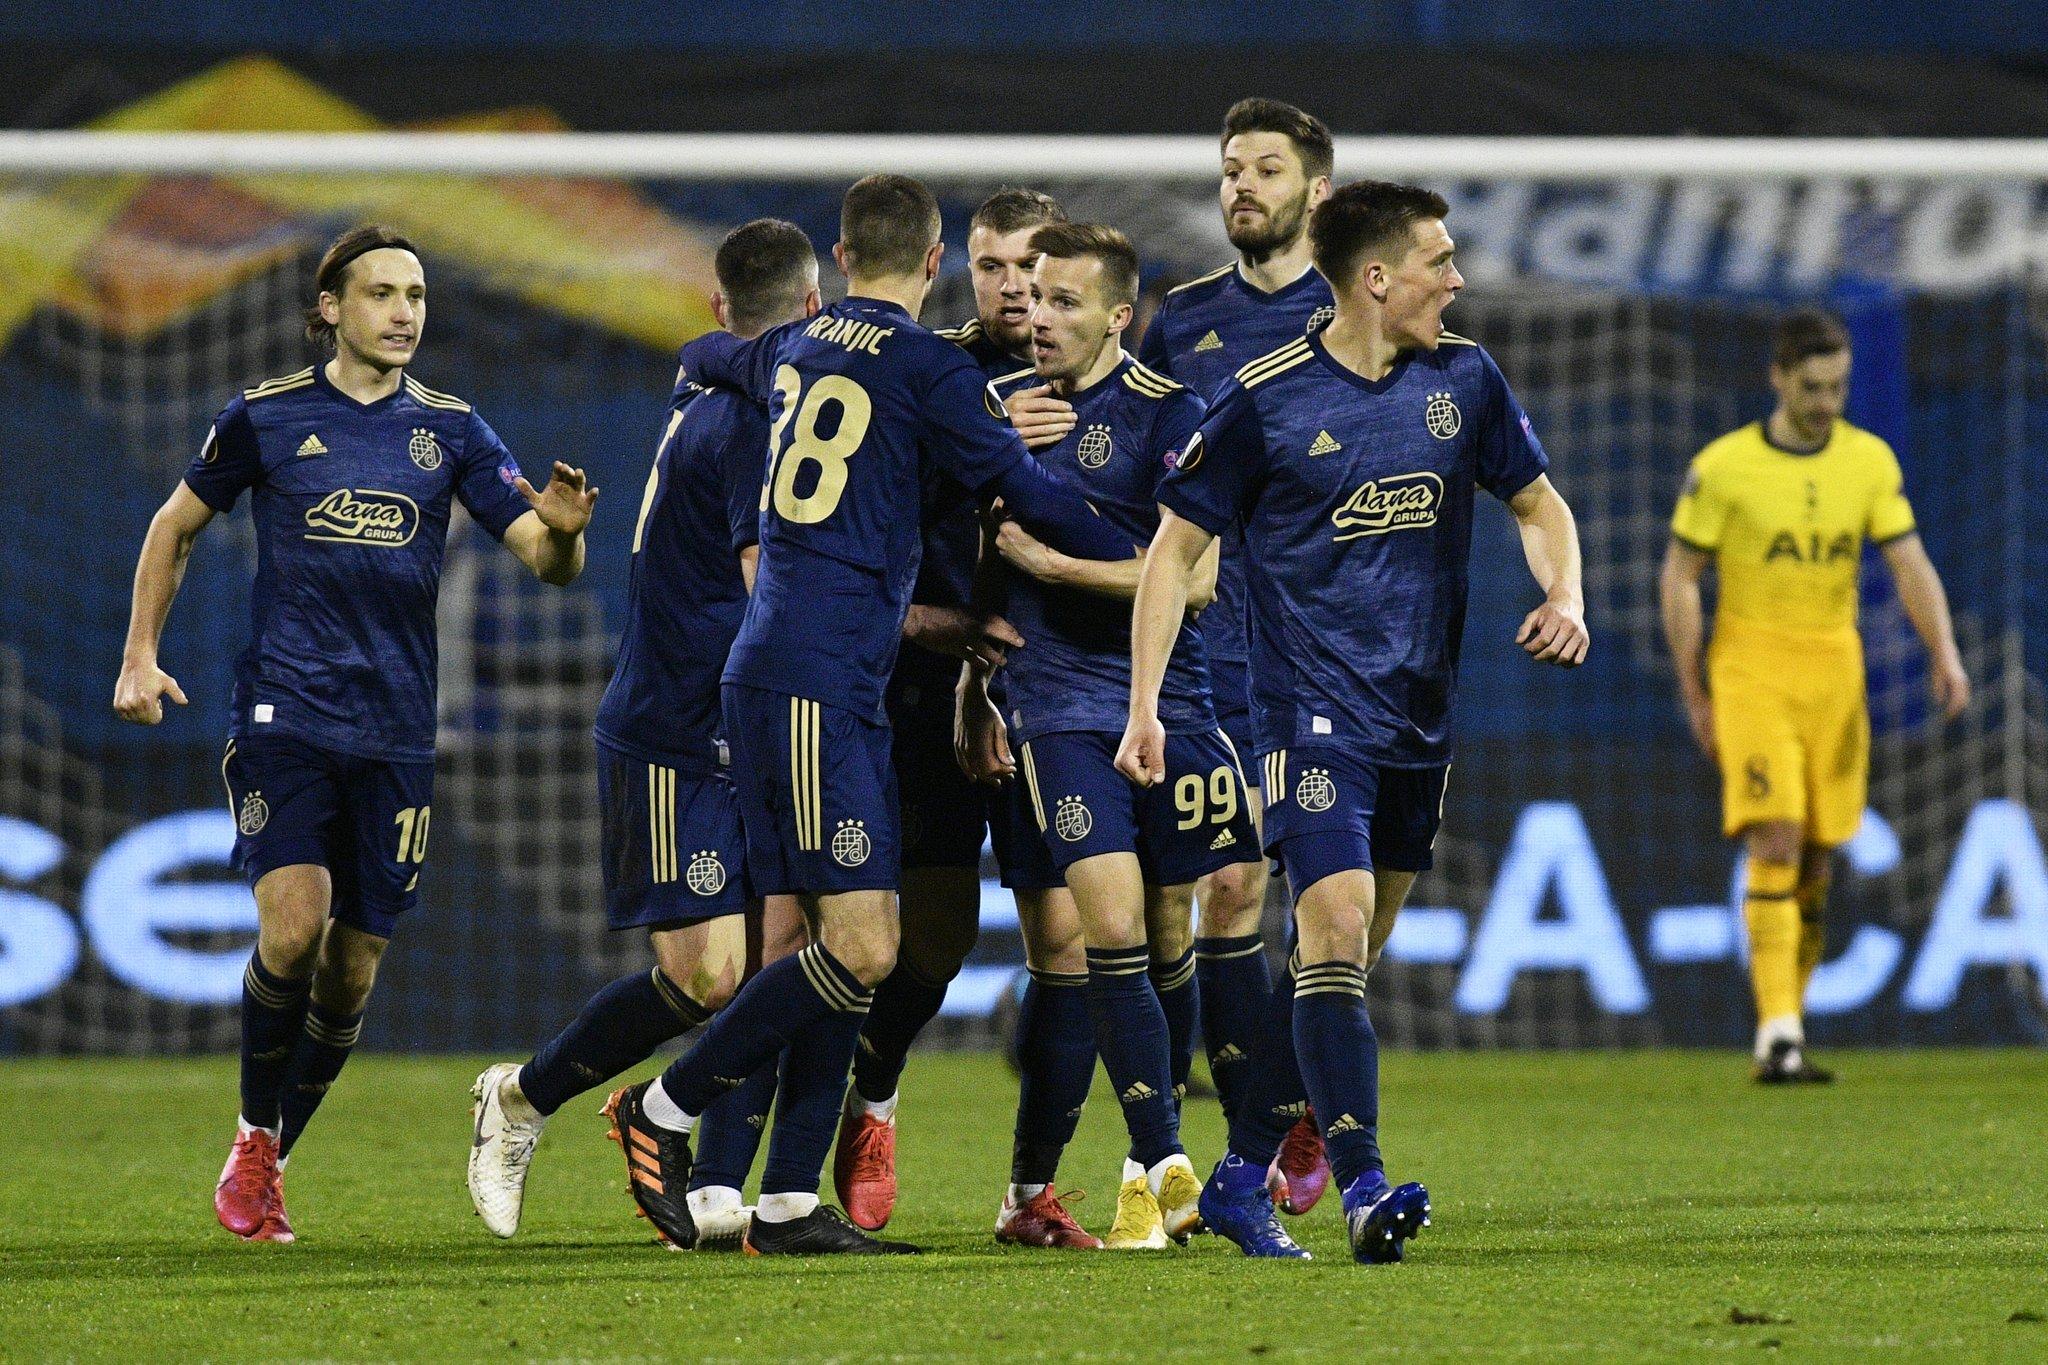 Dinamo Zagreb- Tottenham maç özeti izle 3-0! Orsic attığı gollere maça damga vurdu